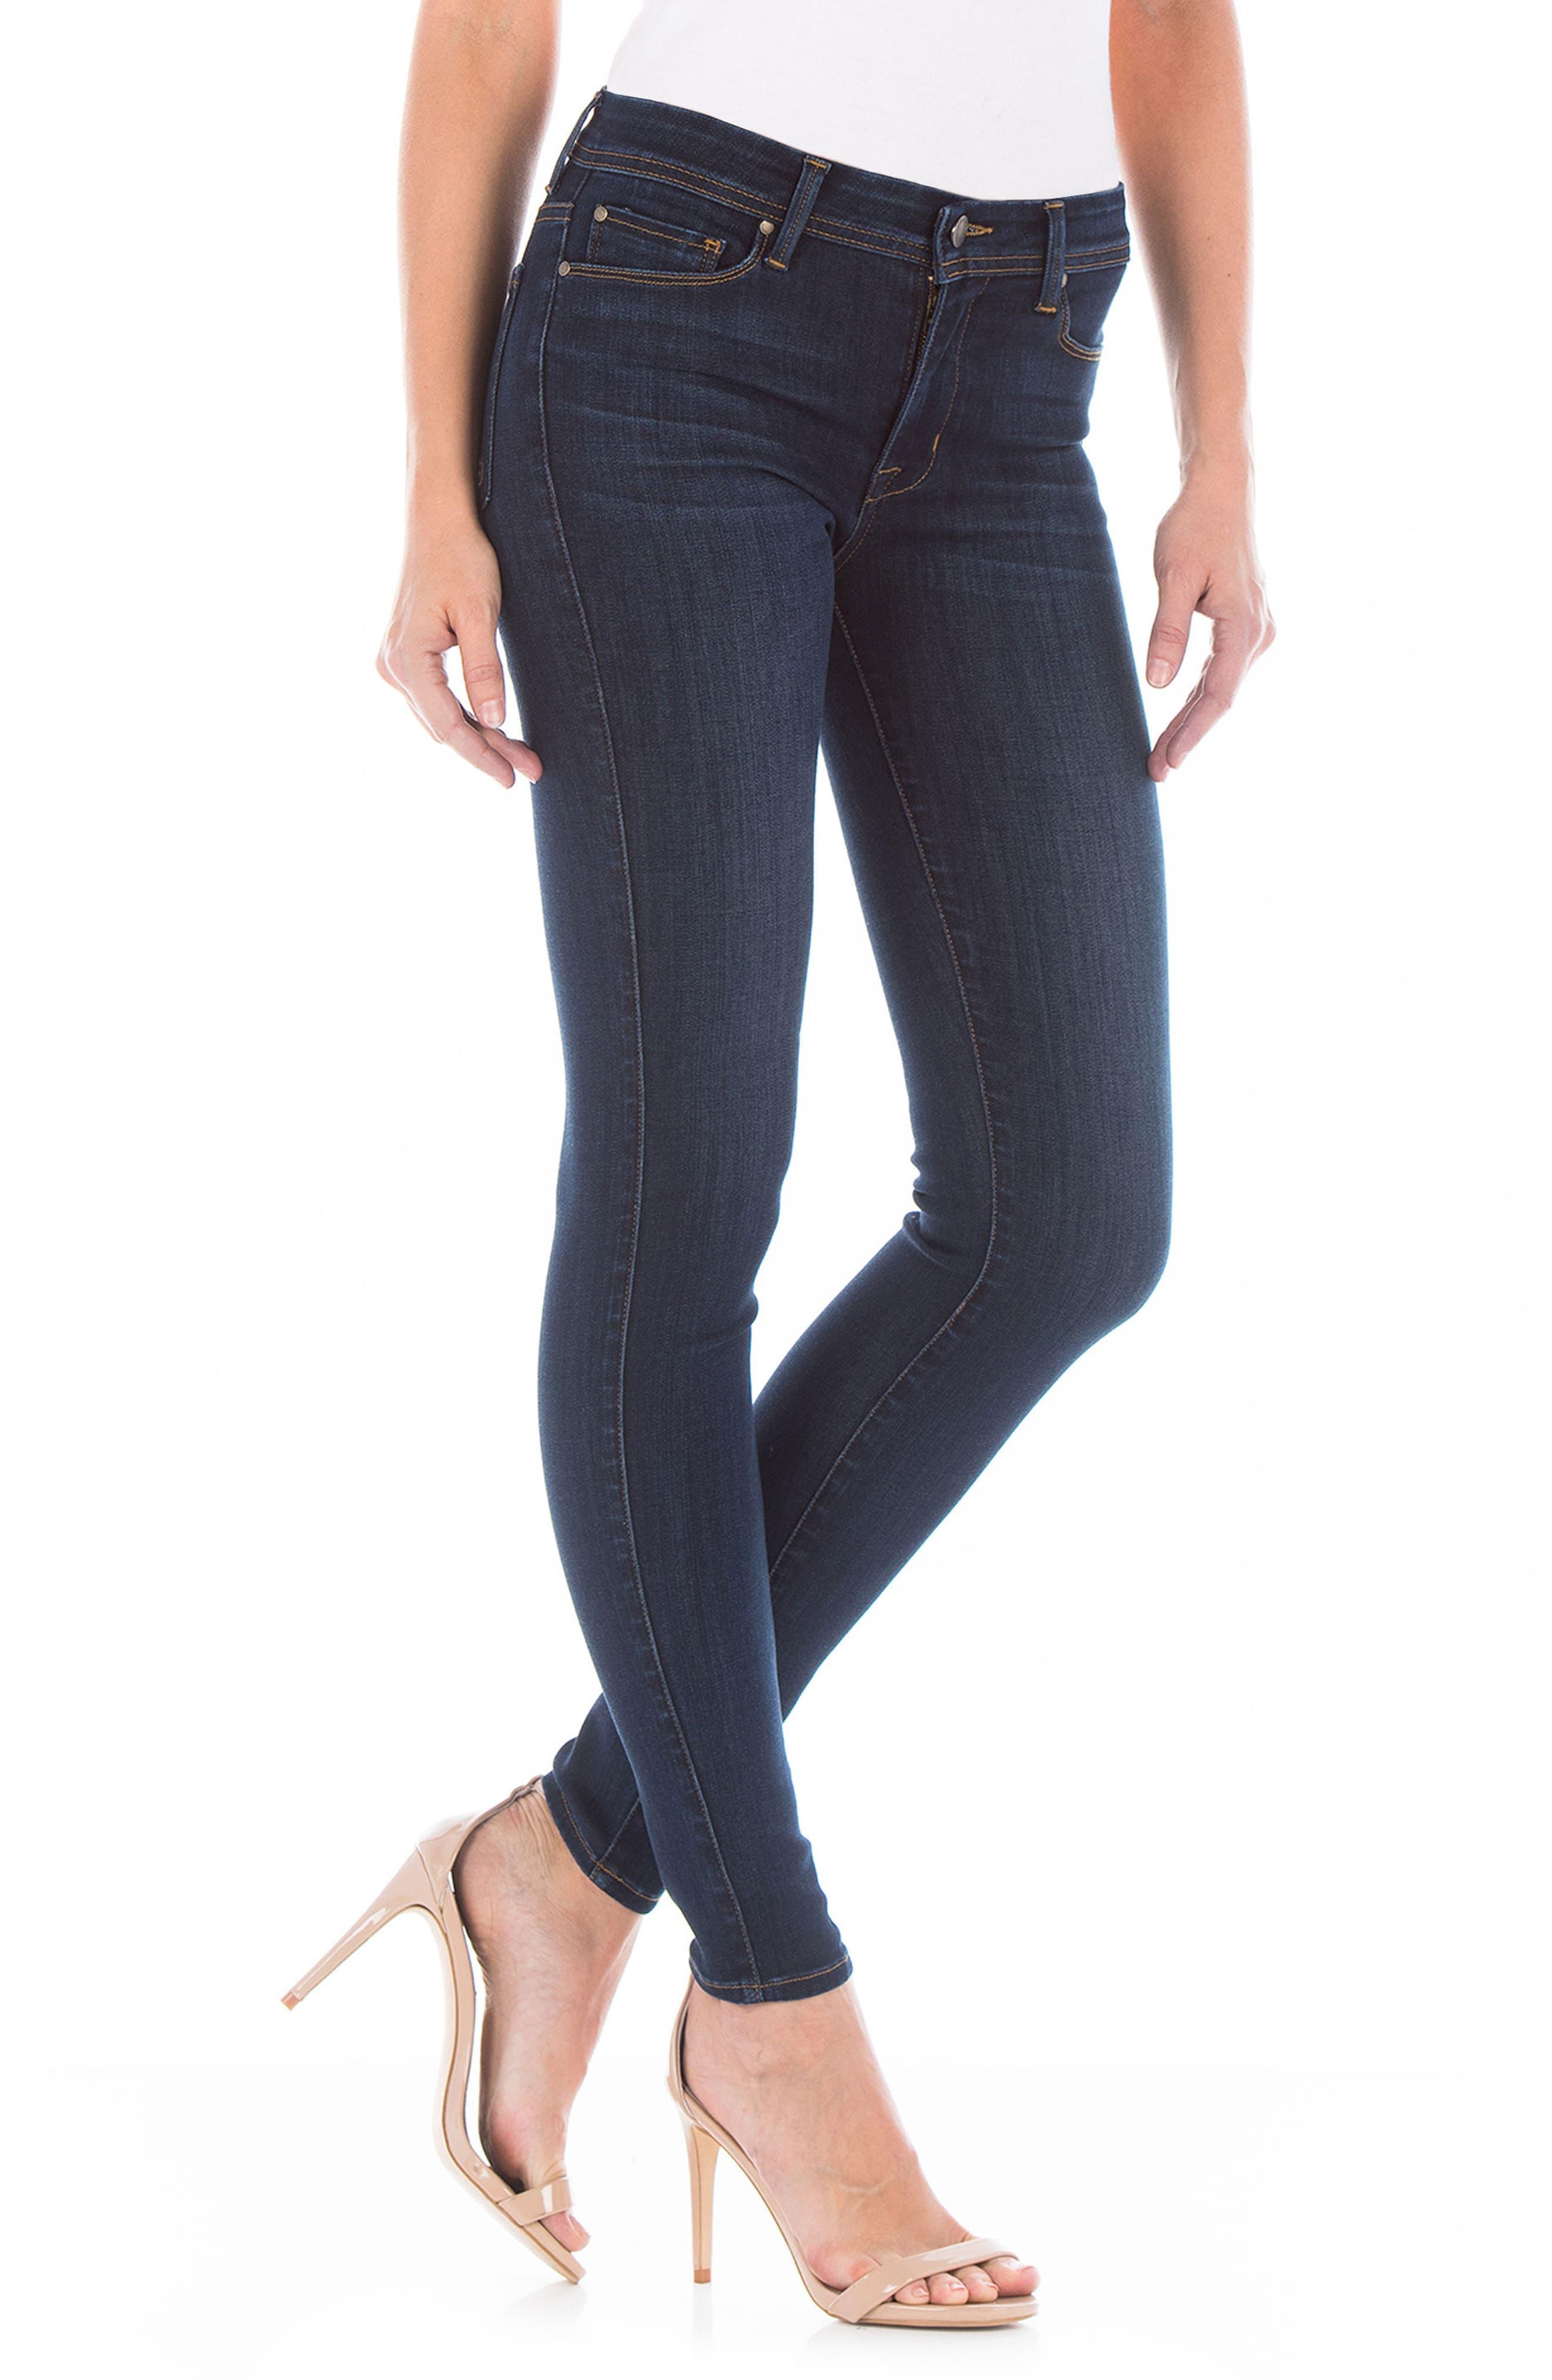 Belvedere Skinny Jeans,                             Alternate thumbnail 3, color,                             400